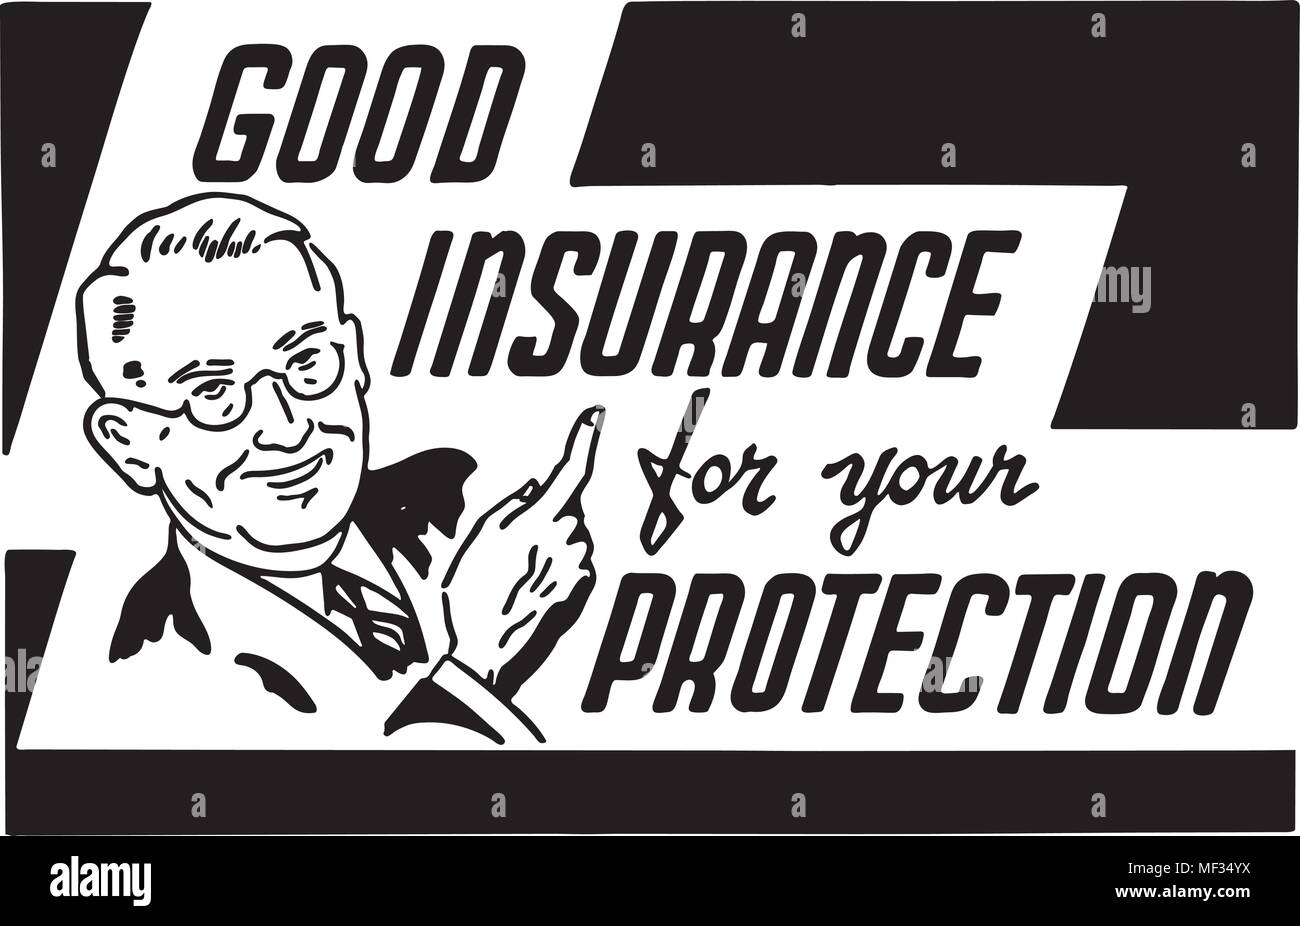 Good Insurance - Retro Ad Art Banner Stock Vector